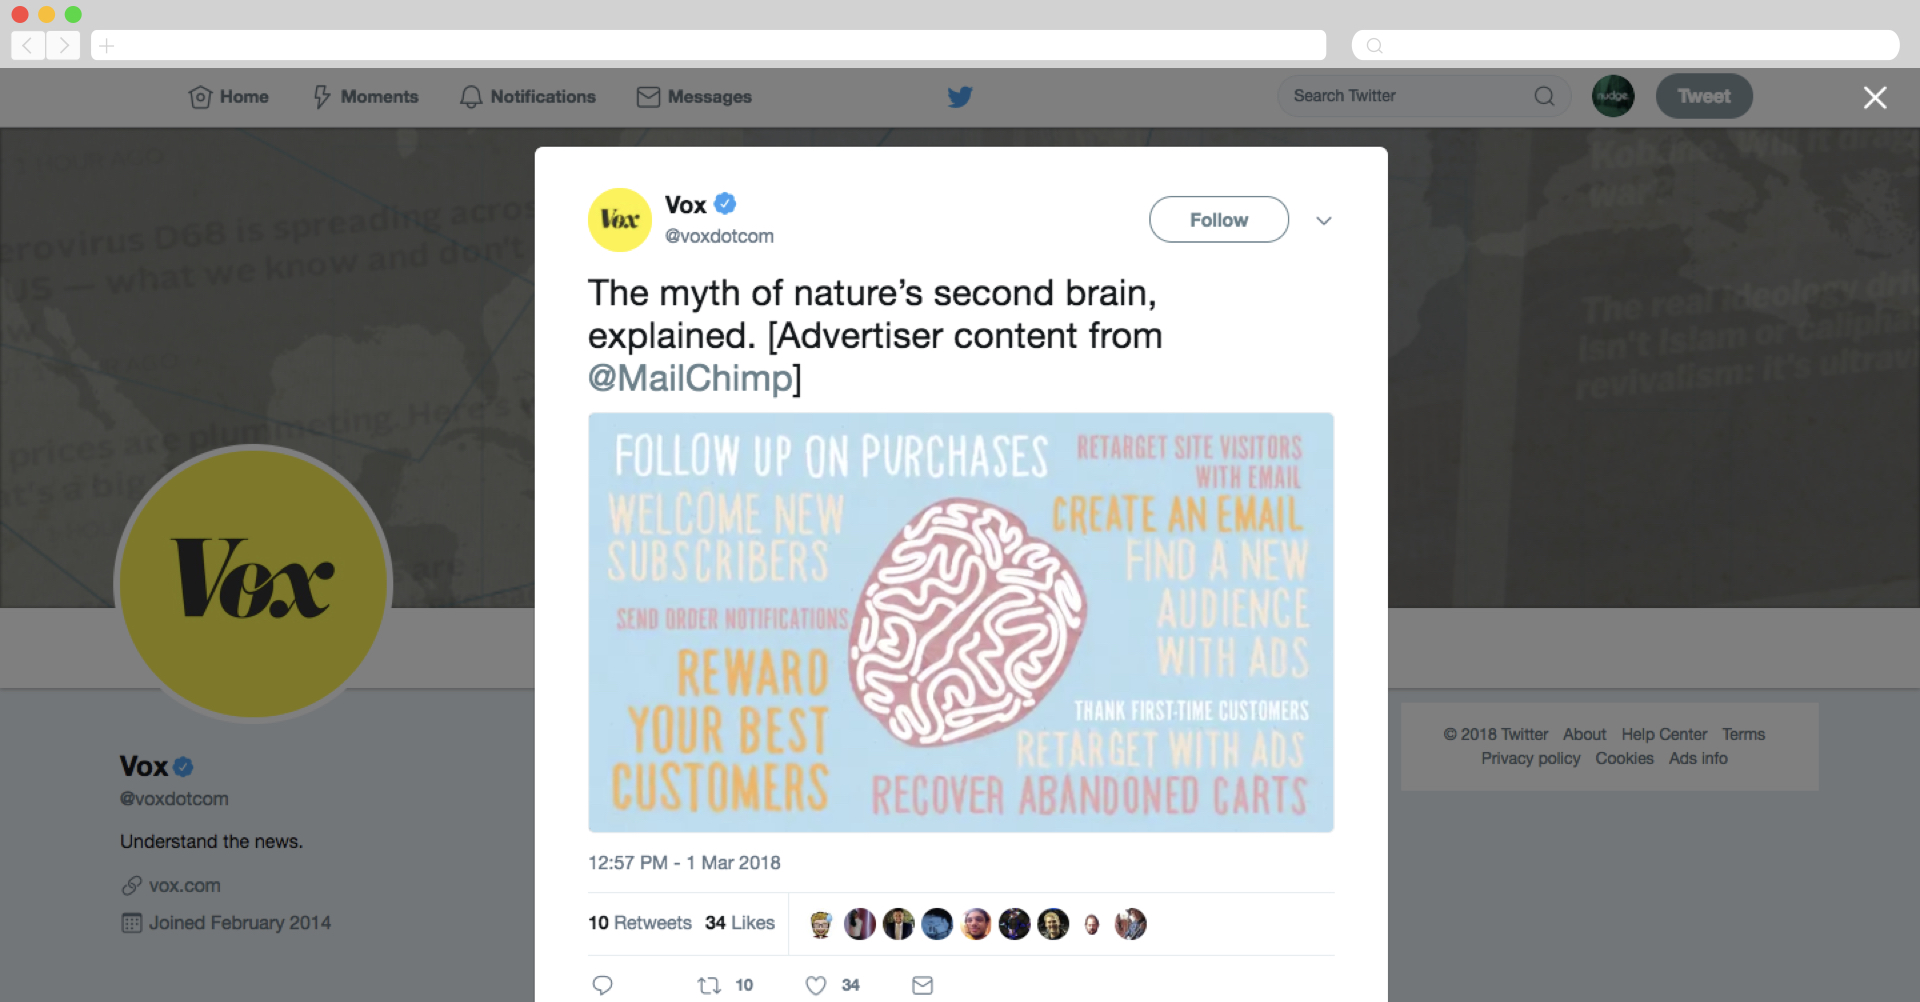 Mailchimp branded content via Vox explainer video